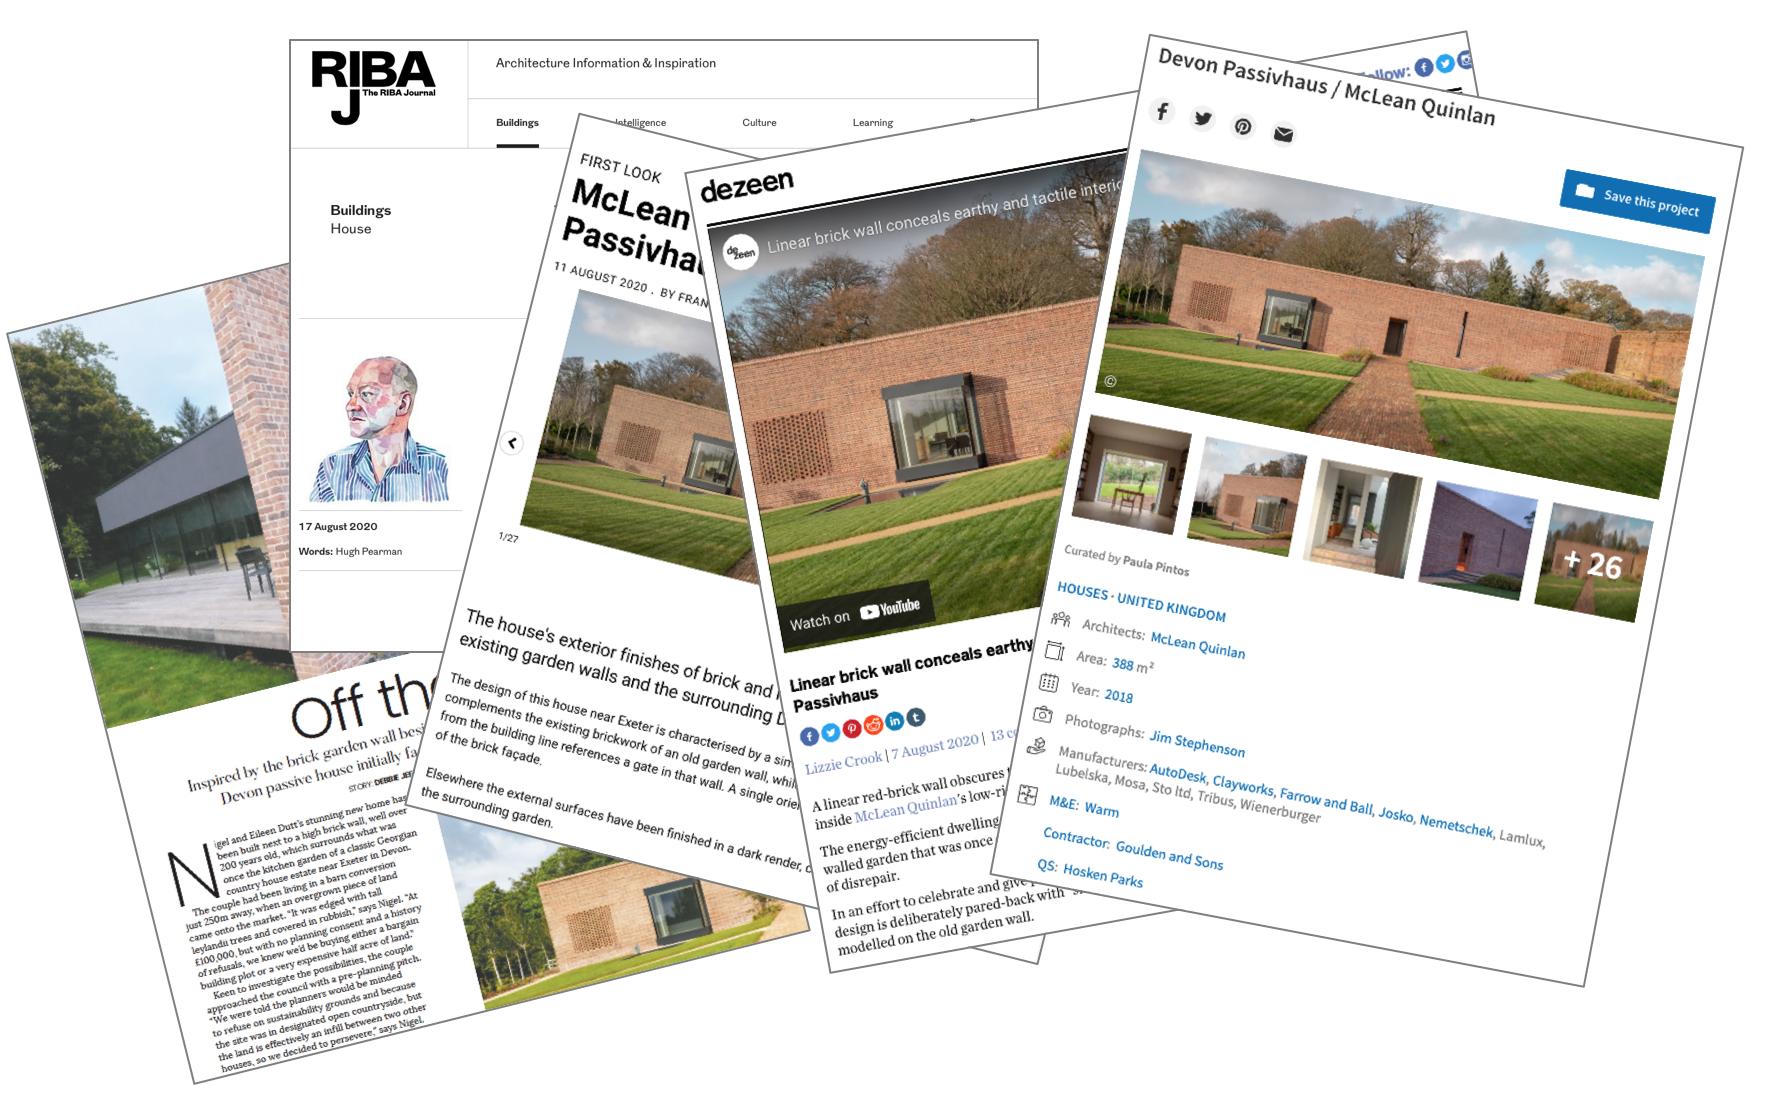 Passivhaus articles